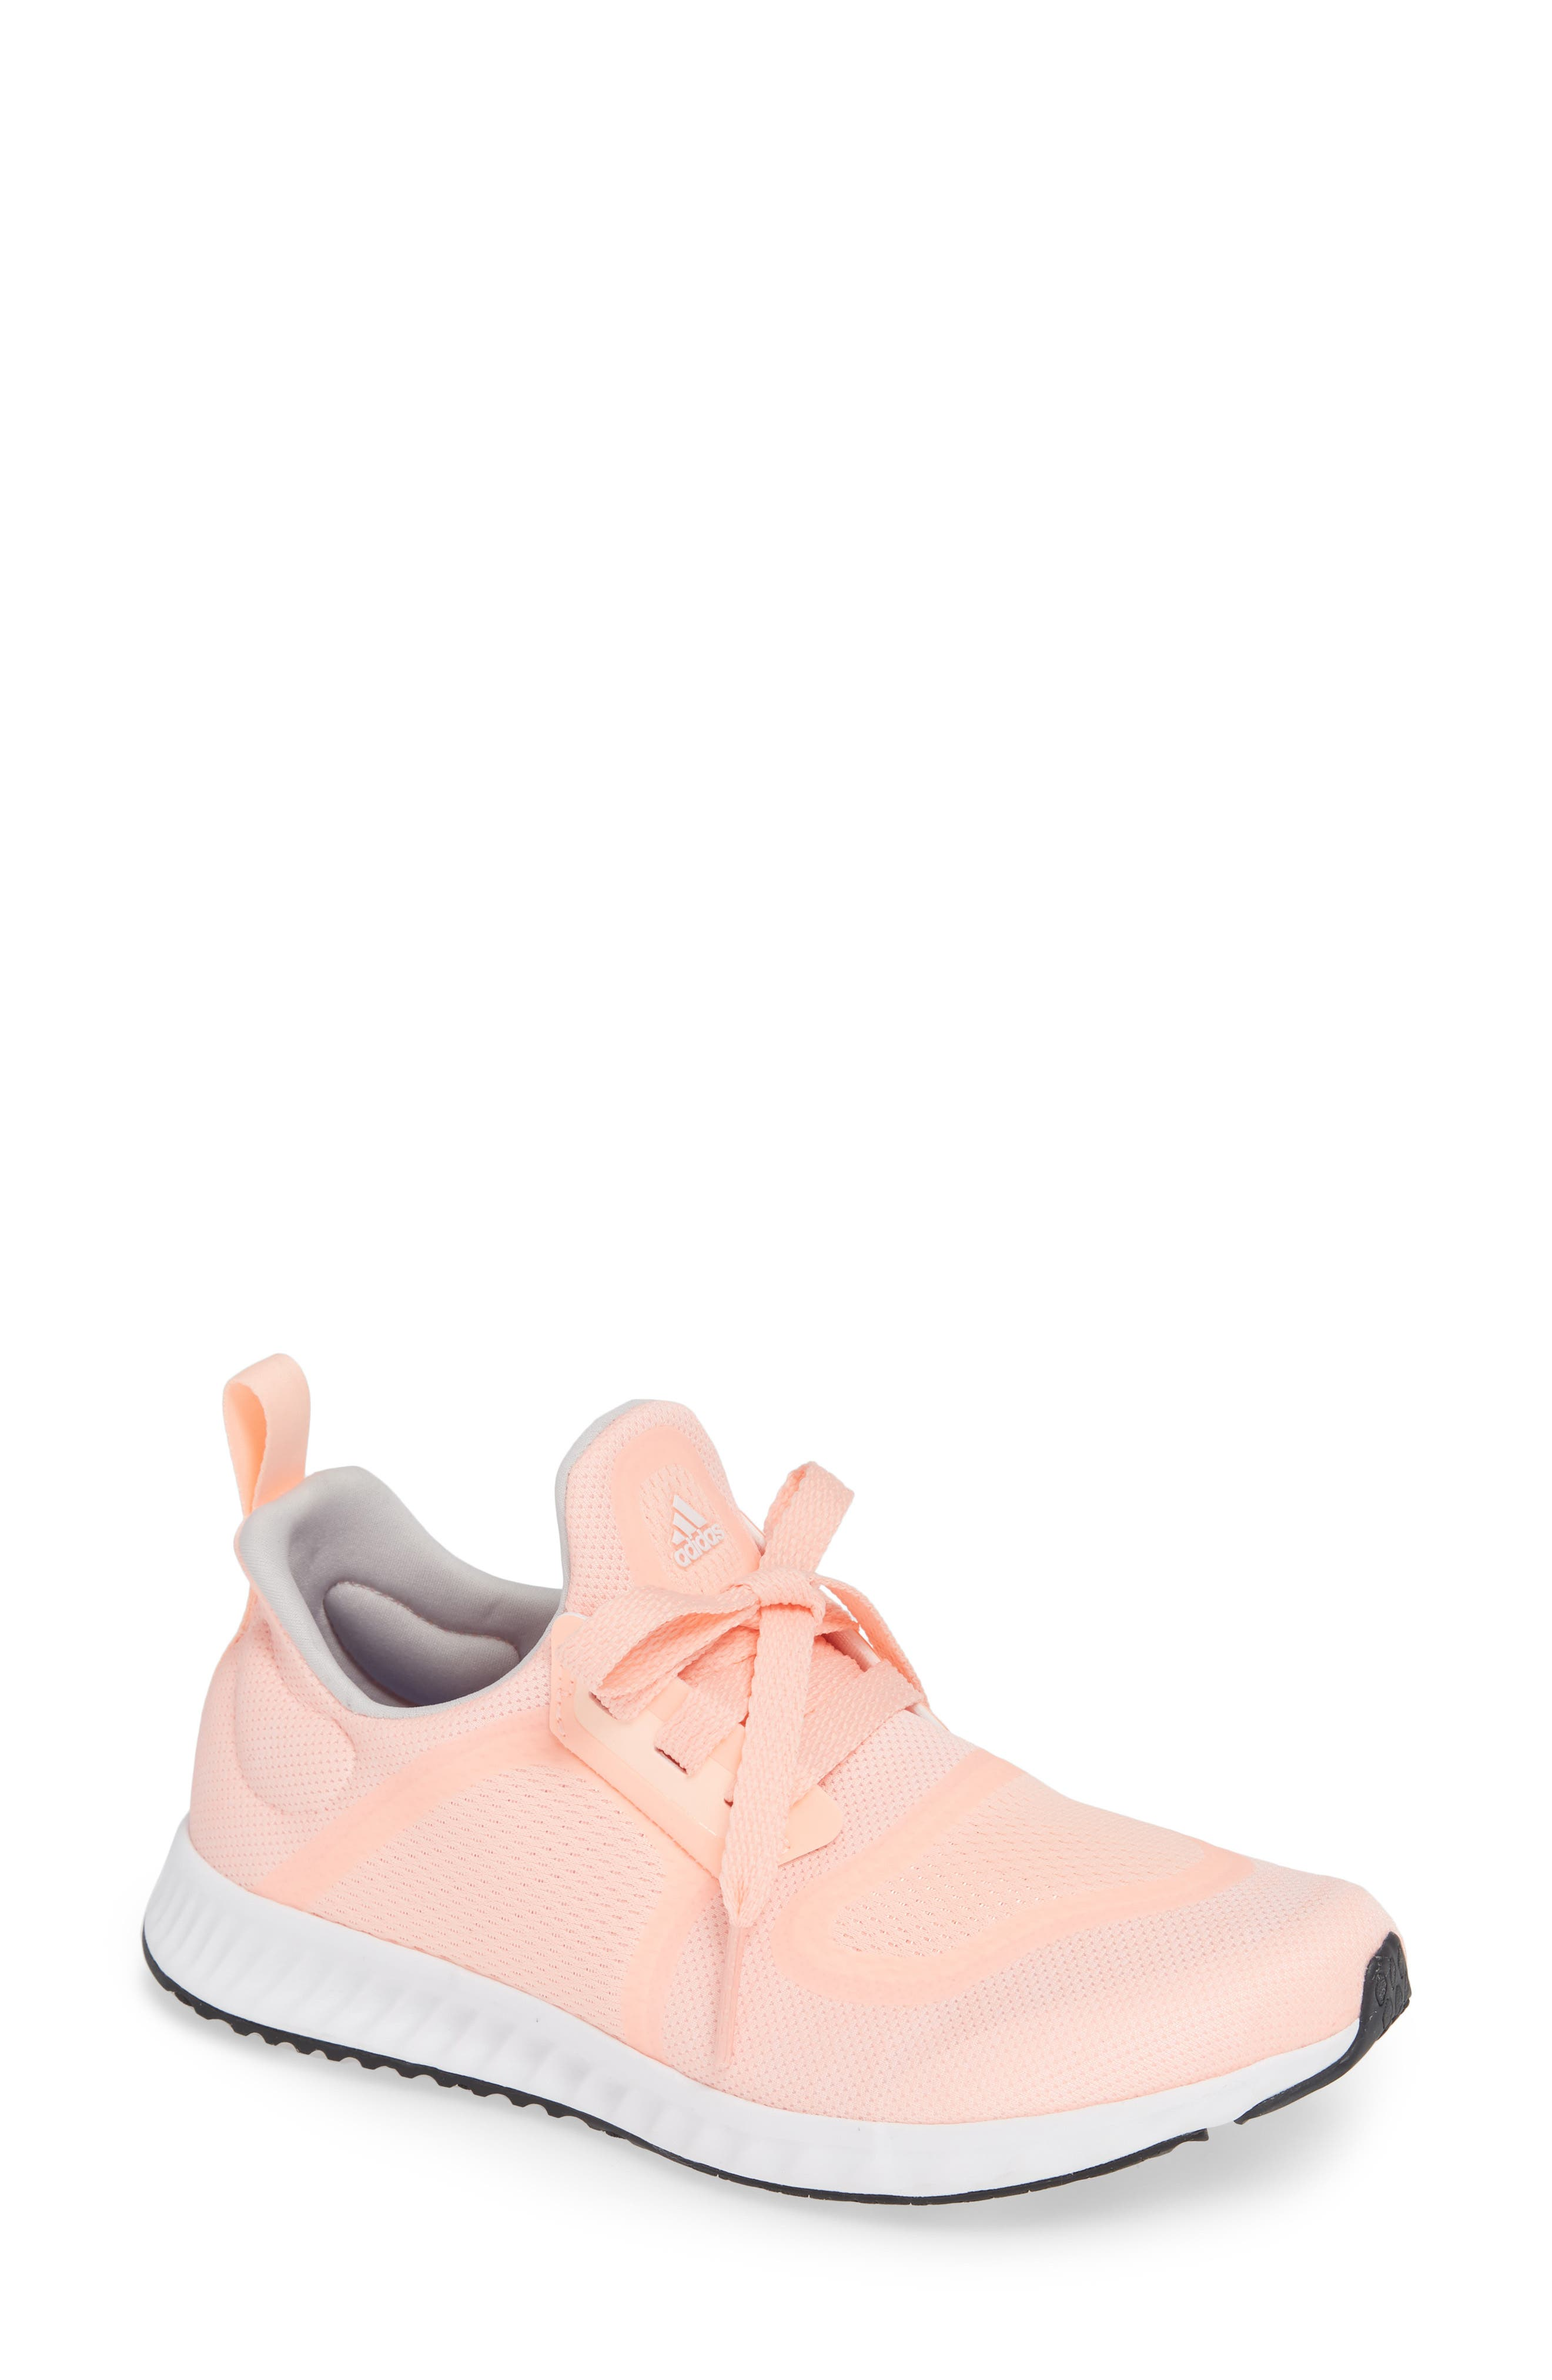 Edge Lux Clima Running Shoe,                         Main,                         color, CLEAR ORANGE/ WHITE